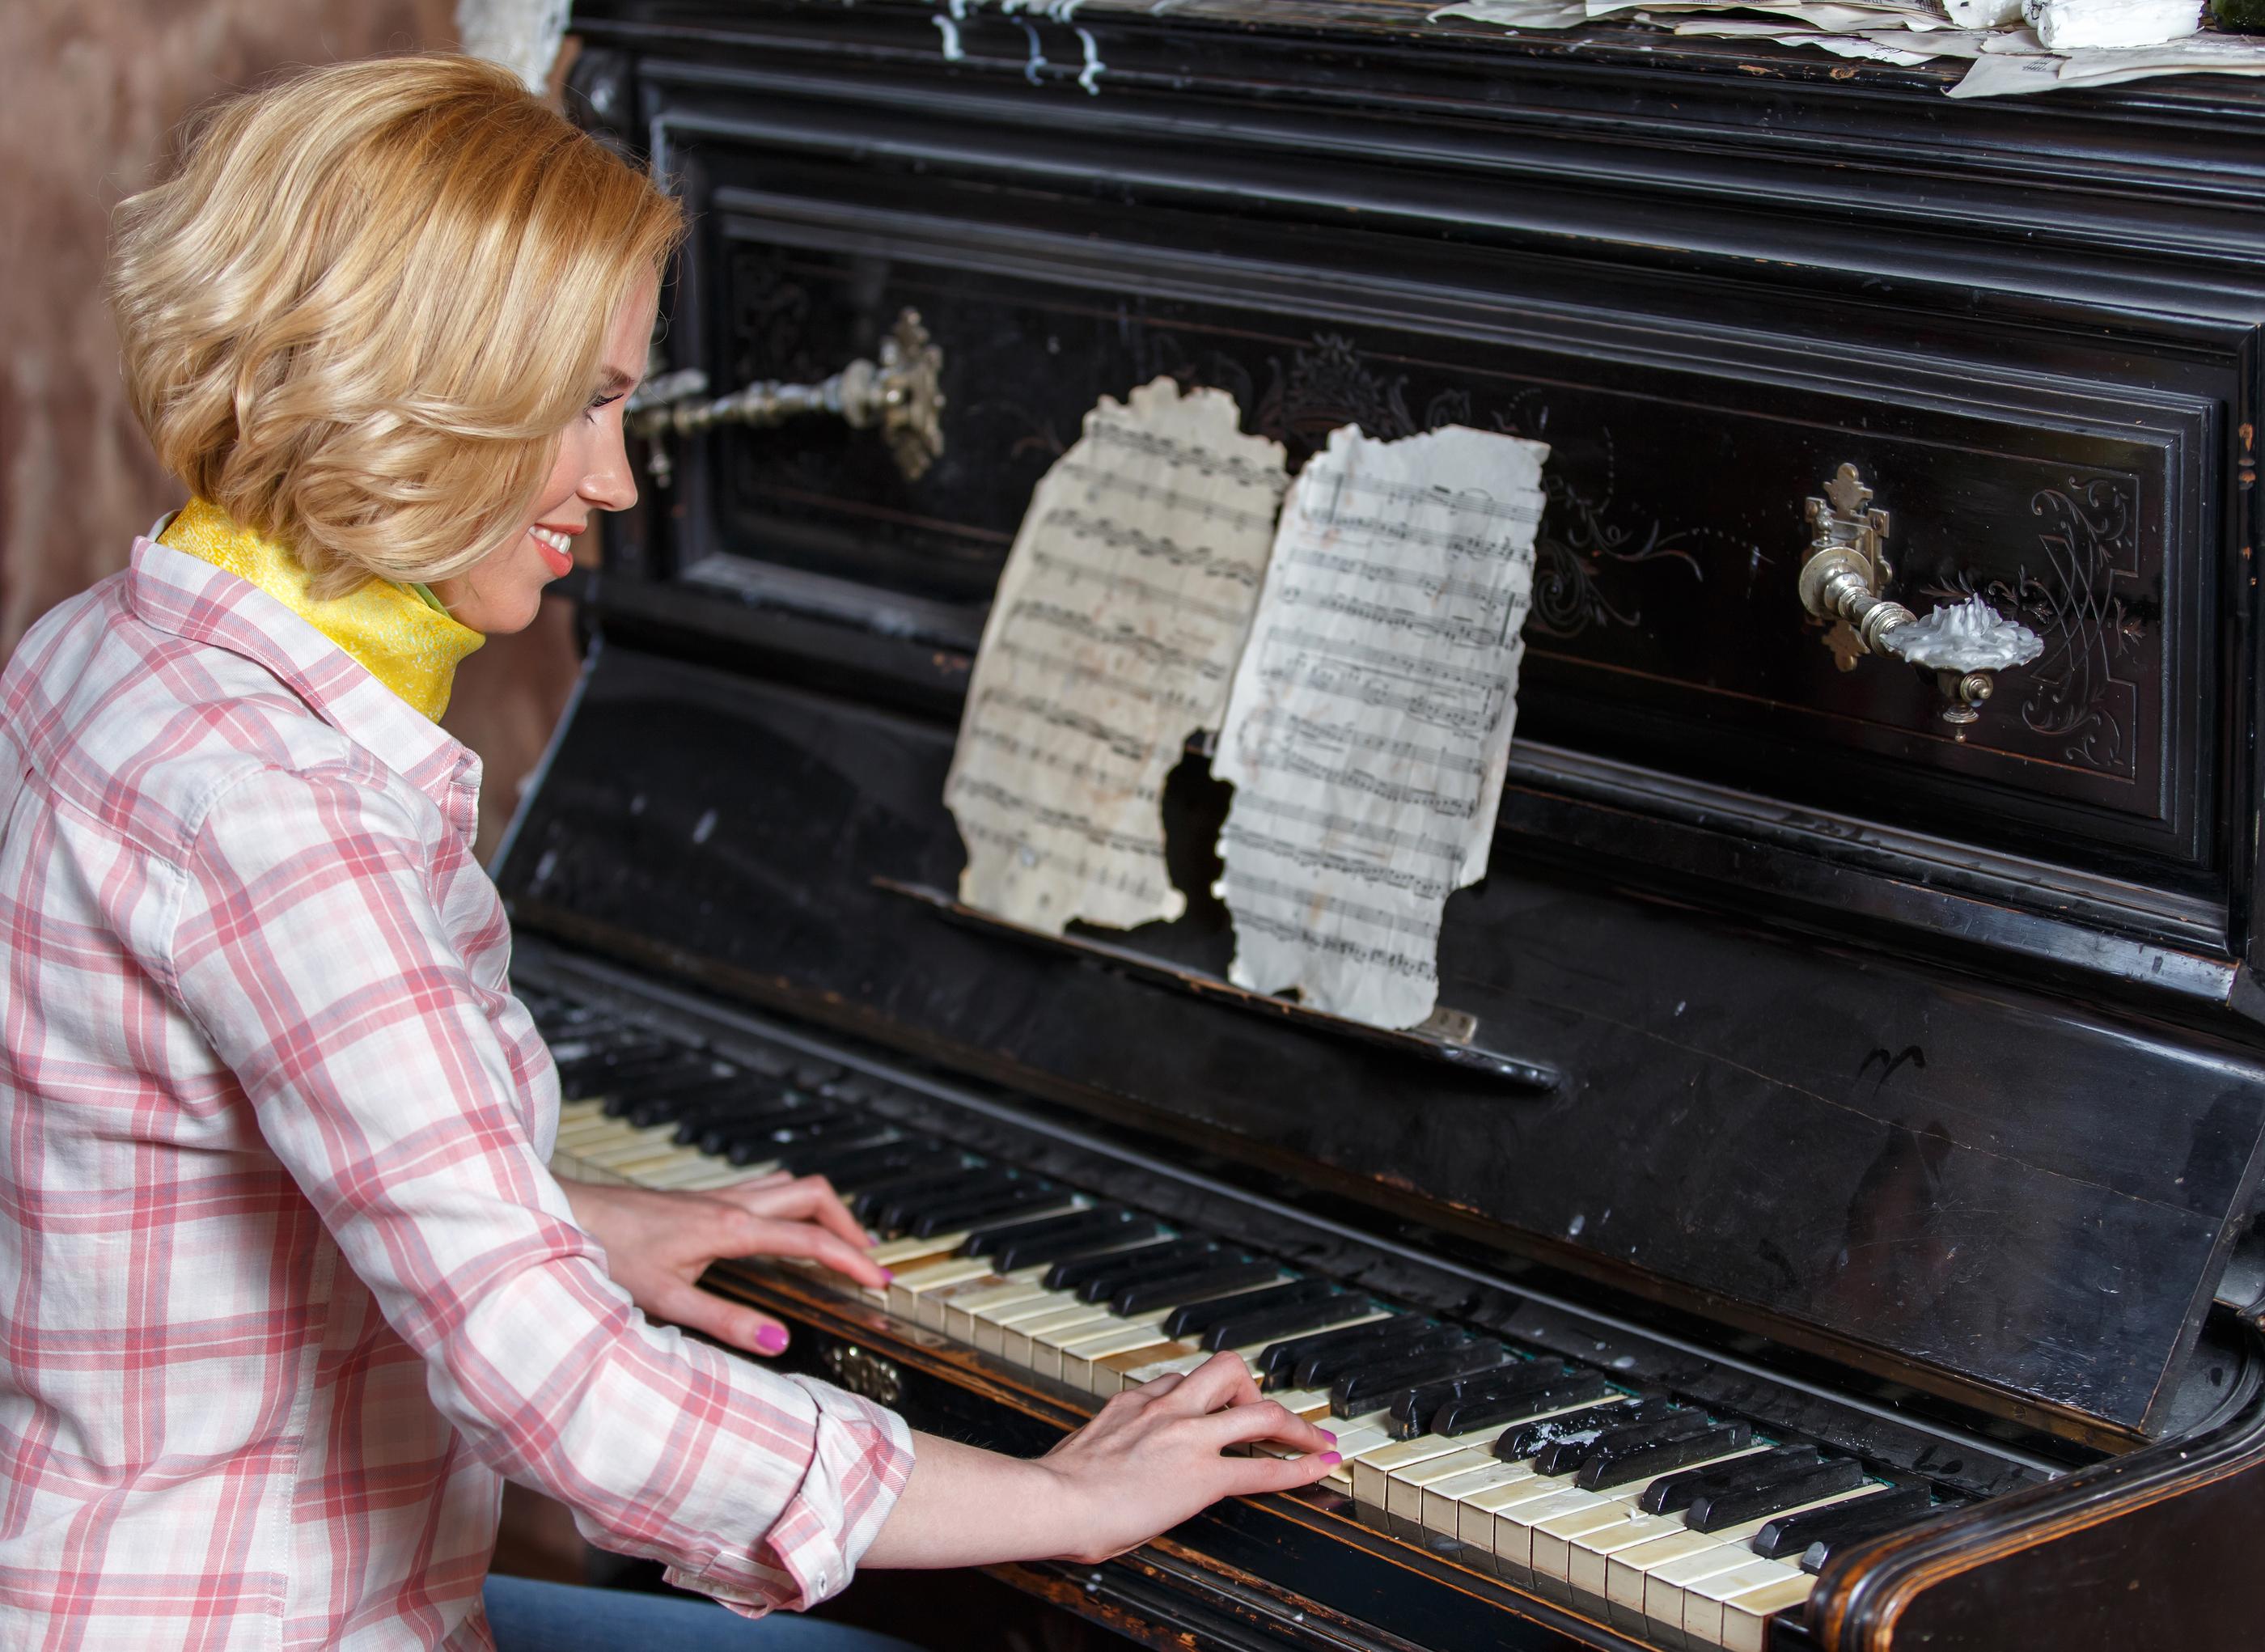 Smiling Female Musician Playing Sheet Music On Retro Piano